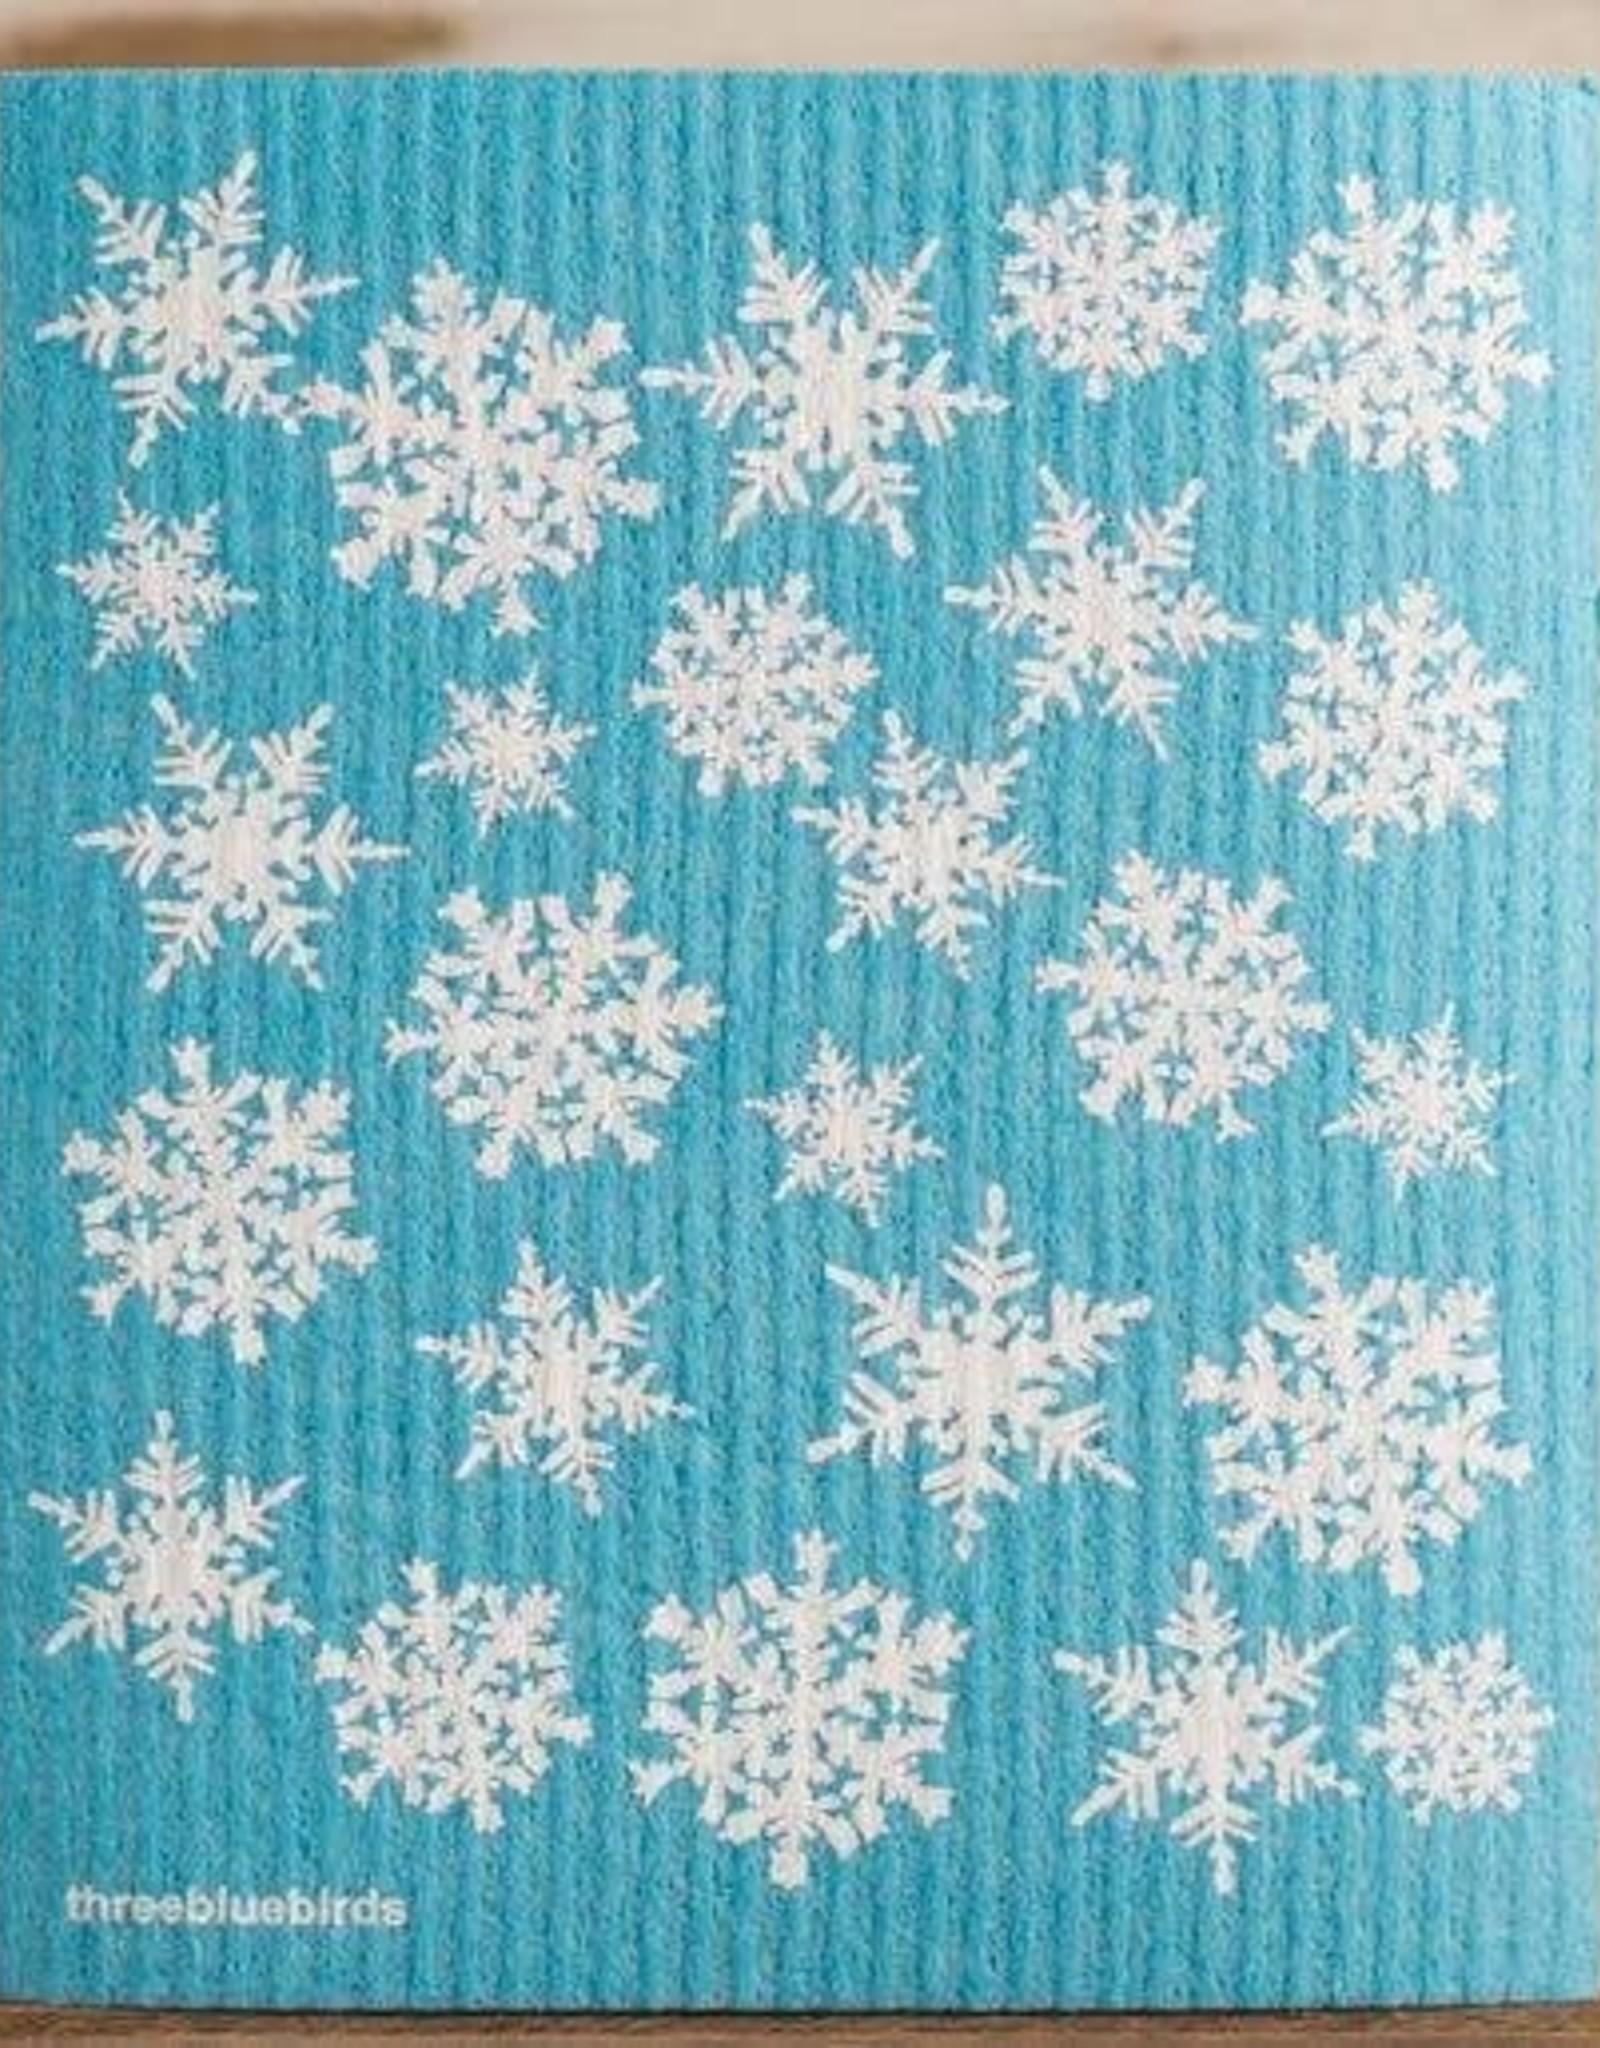 Three Bluebirds Swedish Towels - Holiday